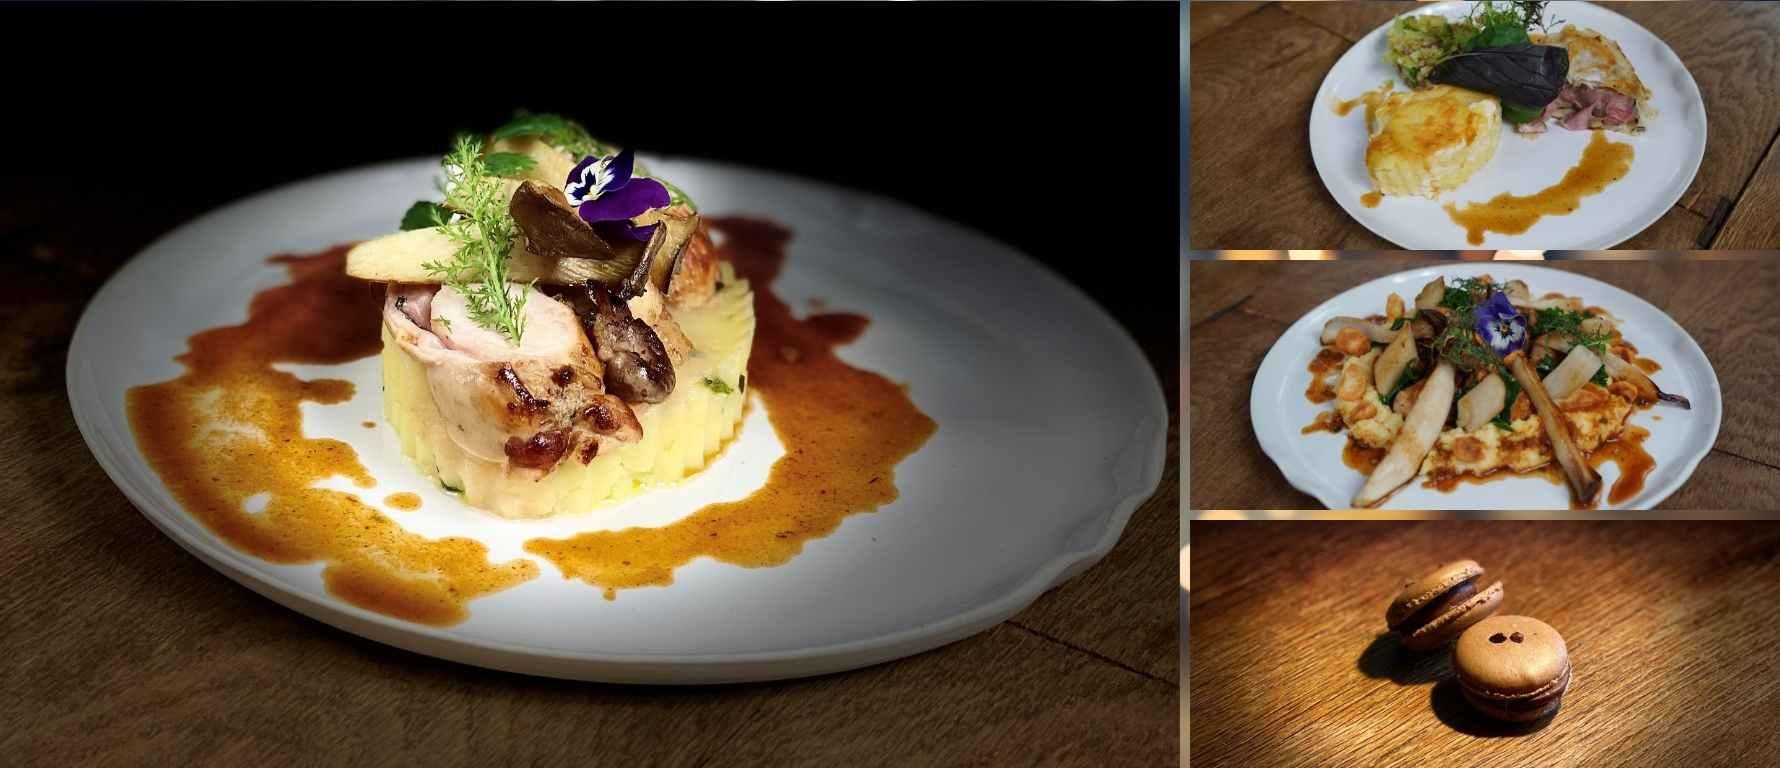 Haute Cuisine von Thibaut Delaroche